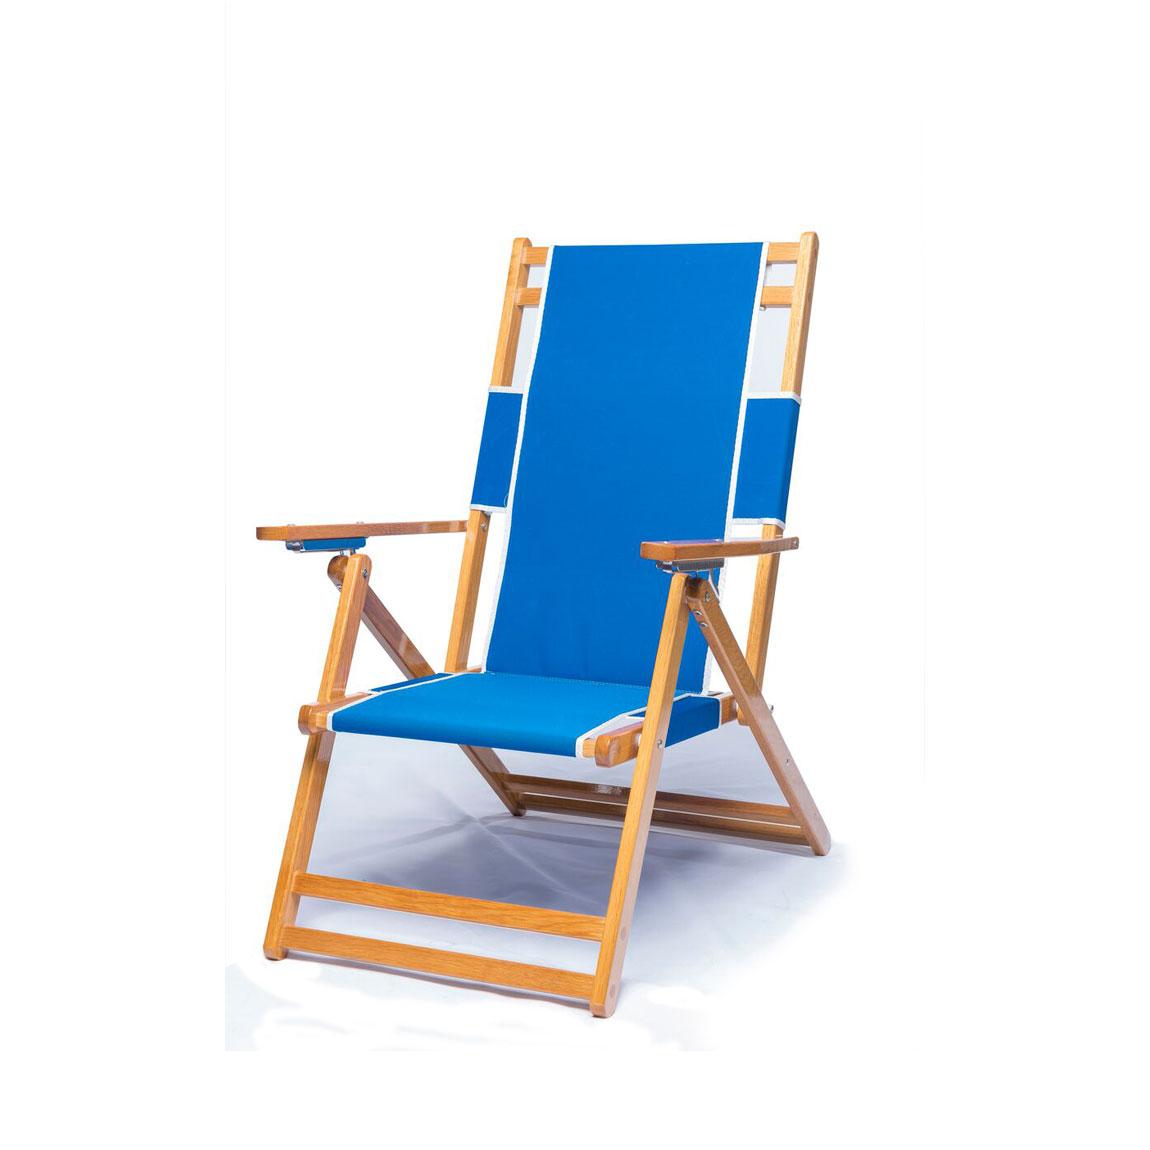 Heavy Duty Commercial Grade Oak Wood Beach Chair / Chaise Lounger